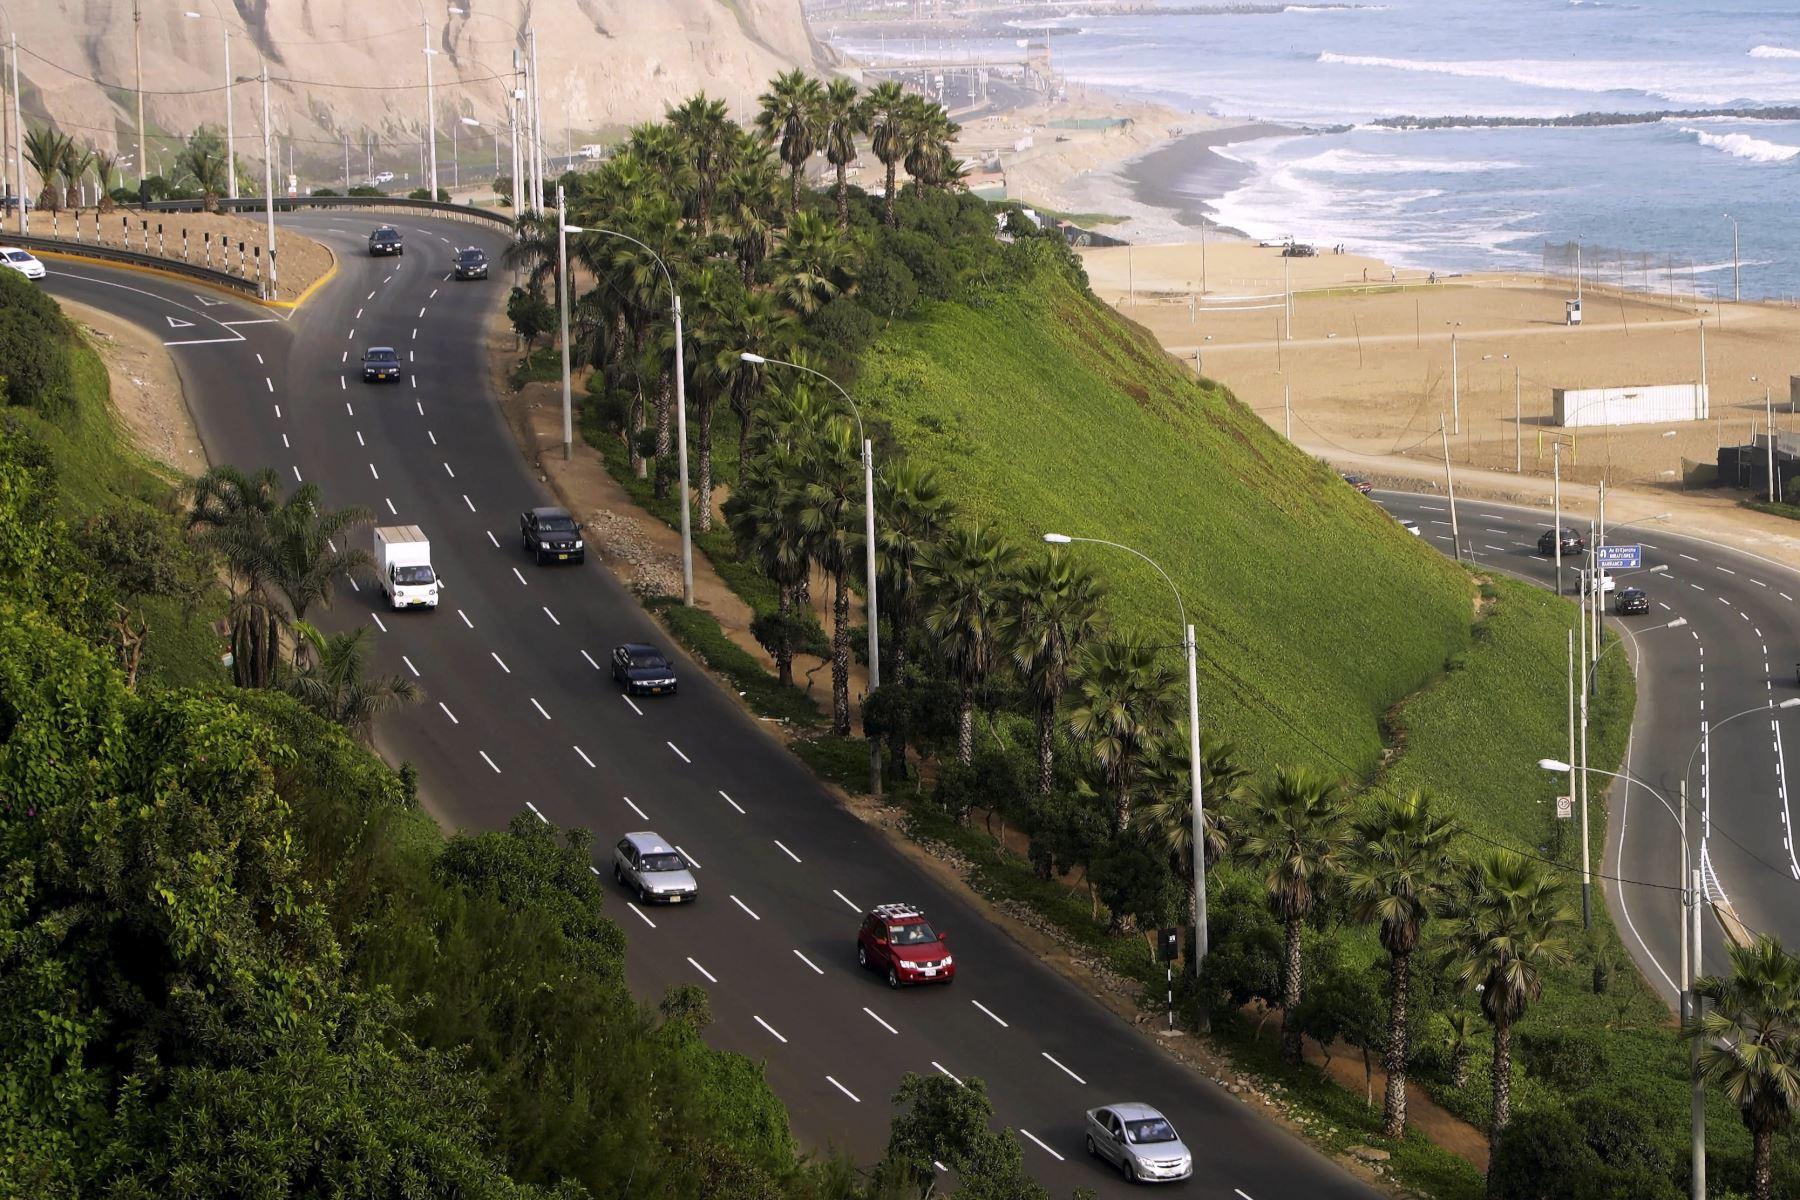 Foto: Municipalidad de Lima